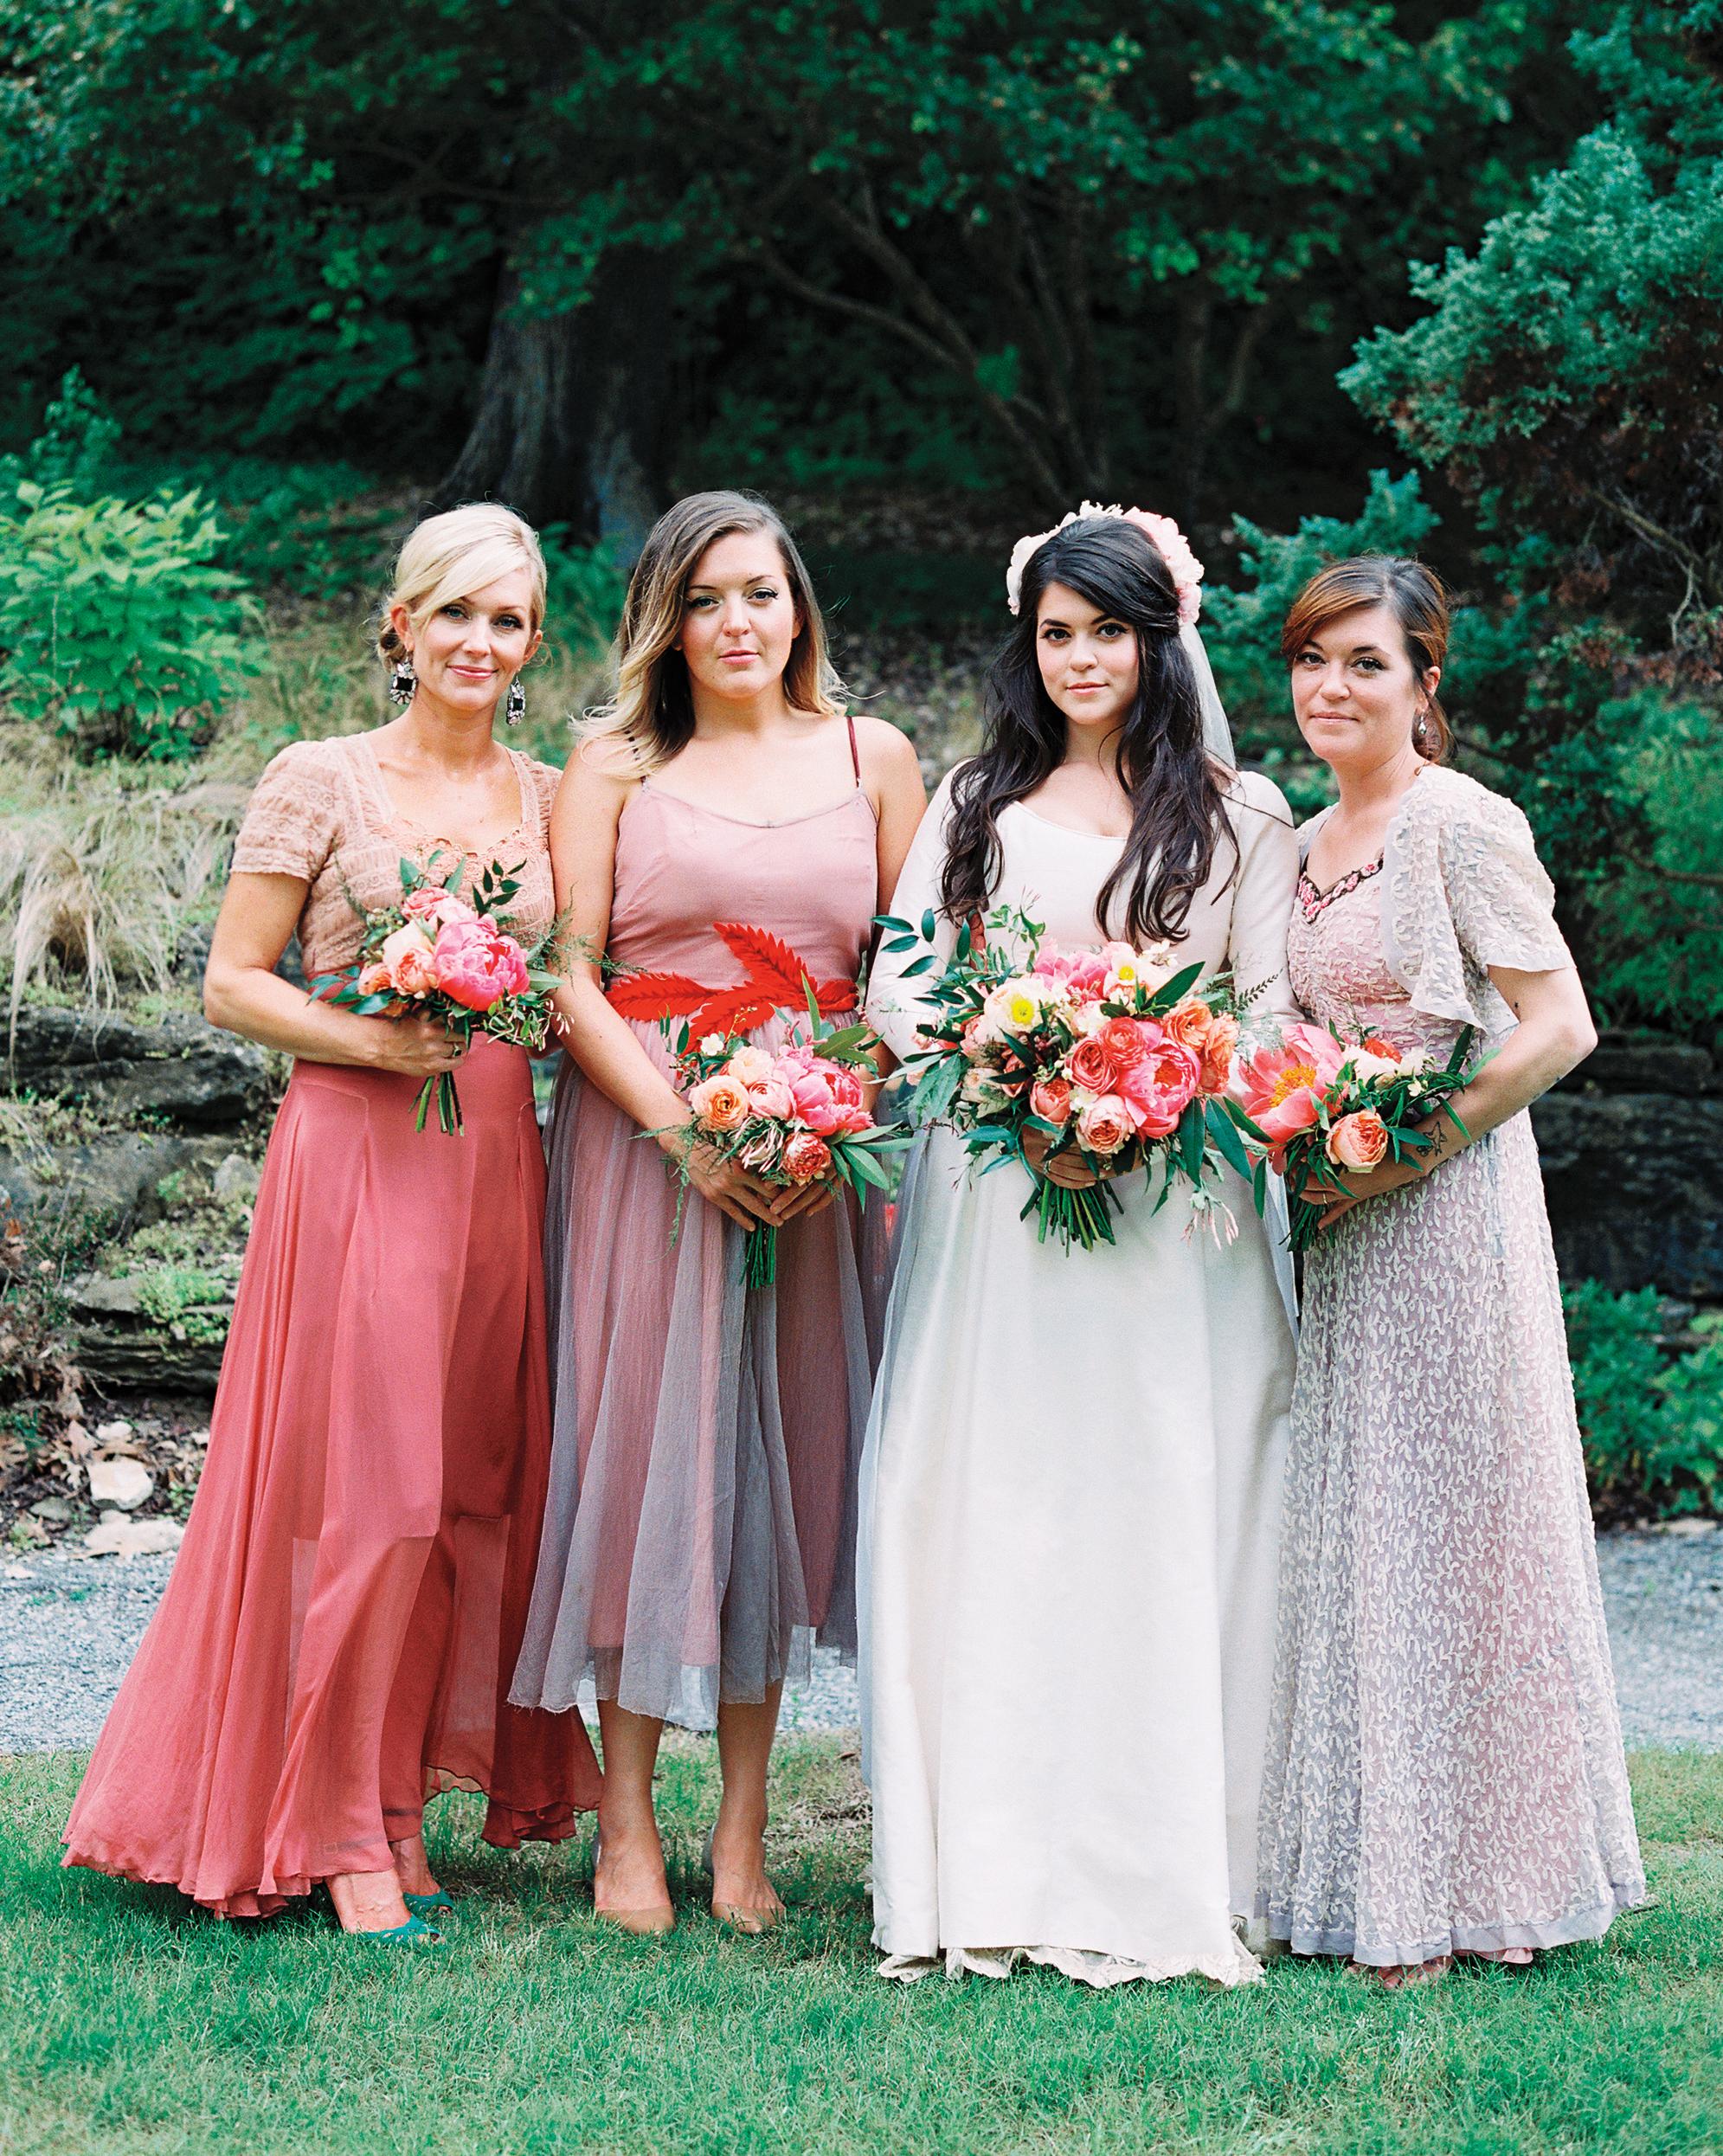 carrie-dan-ceremony-bride-bridesmaids-053114-f-009-s111627.jpg